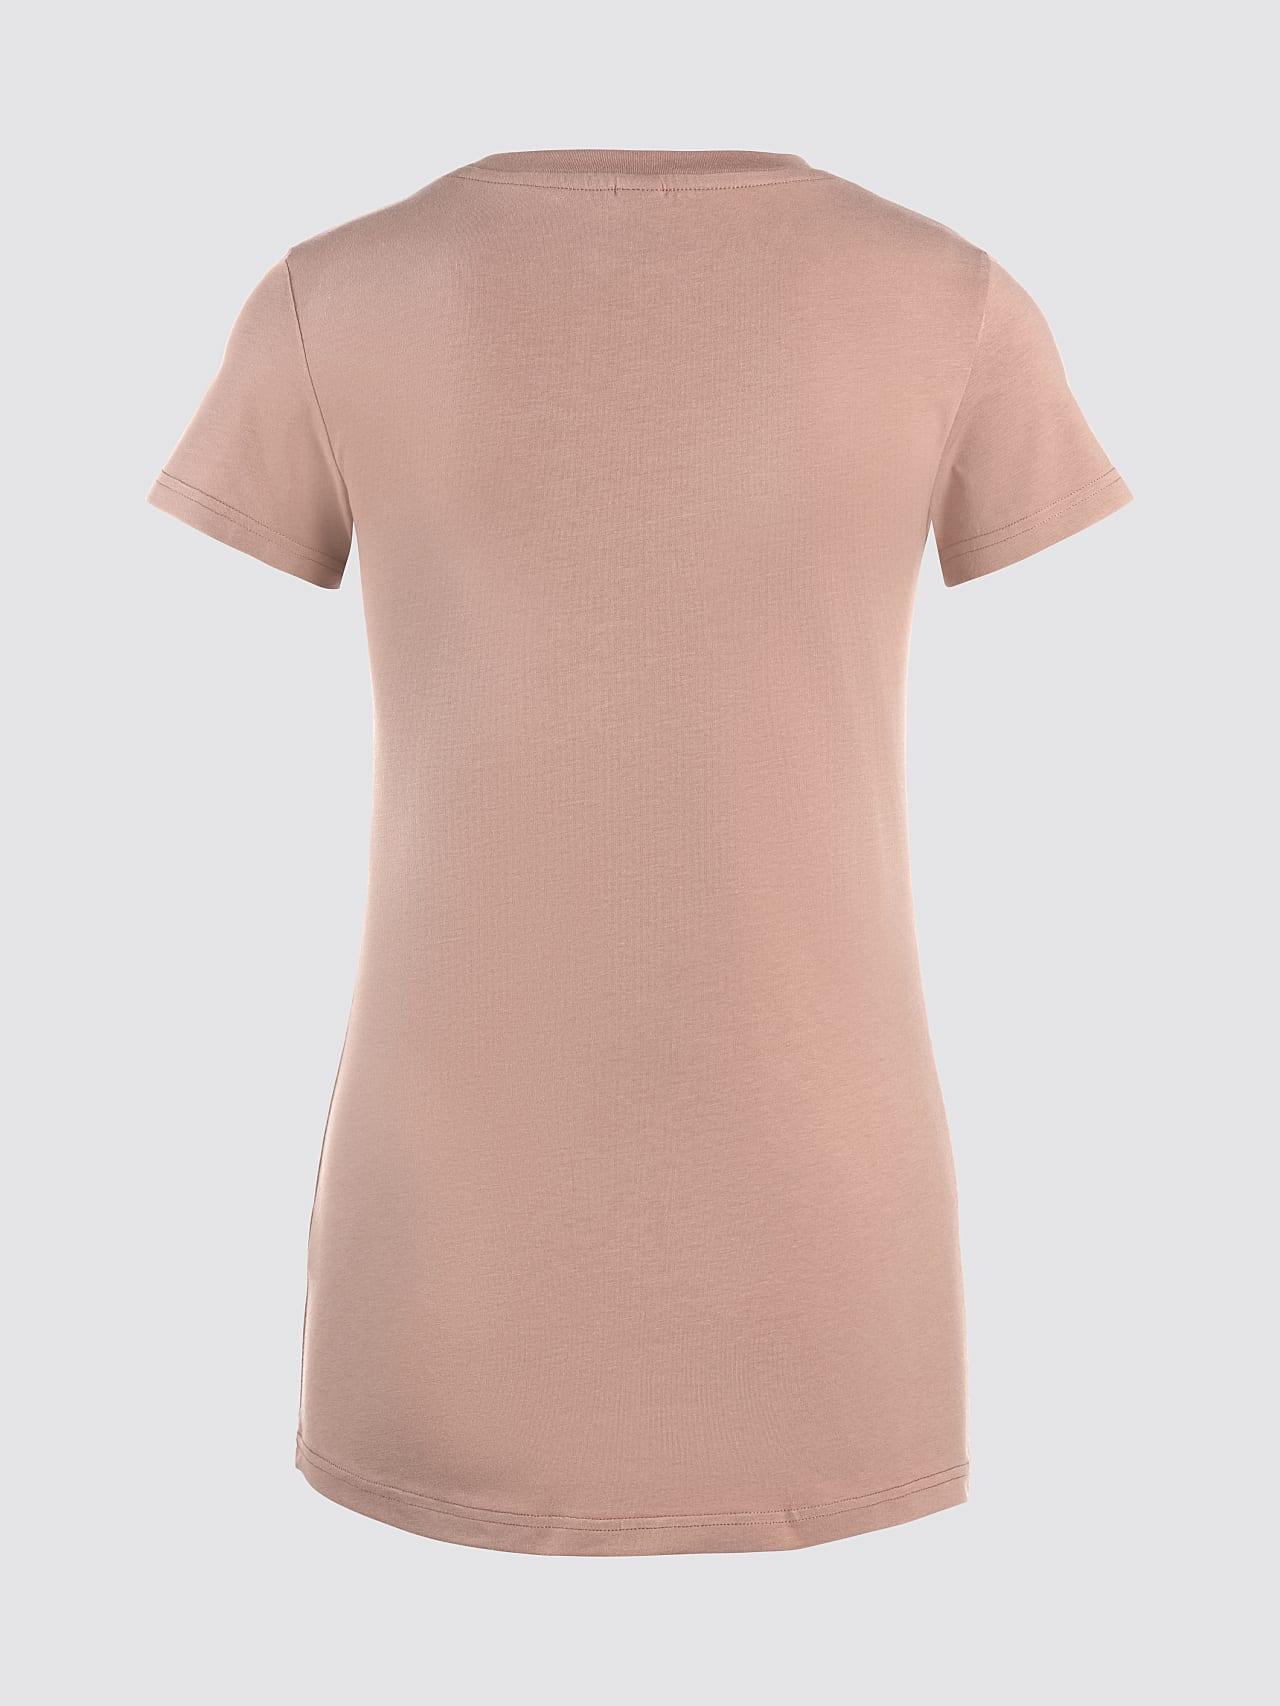 JERU V2.Y4.02 Signature Logo T-Shirt Rosé Links Alpha Tauri